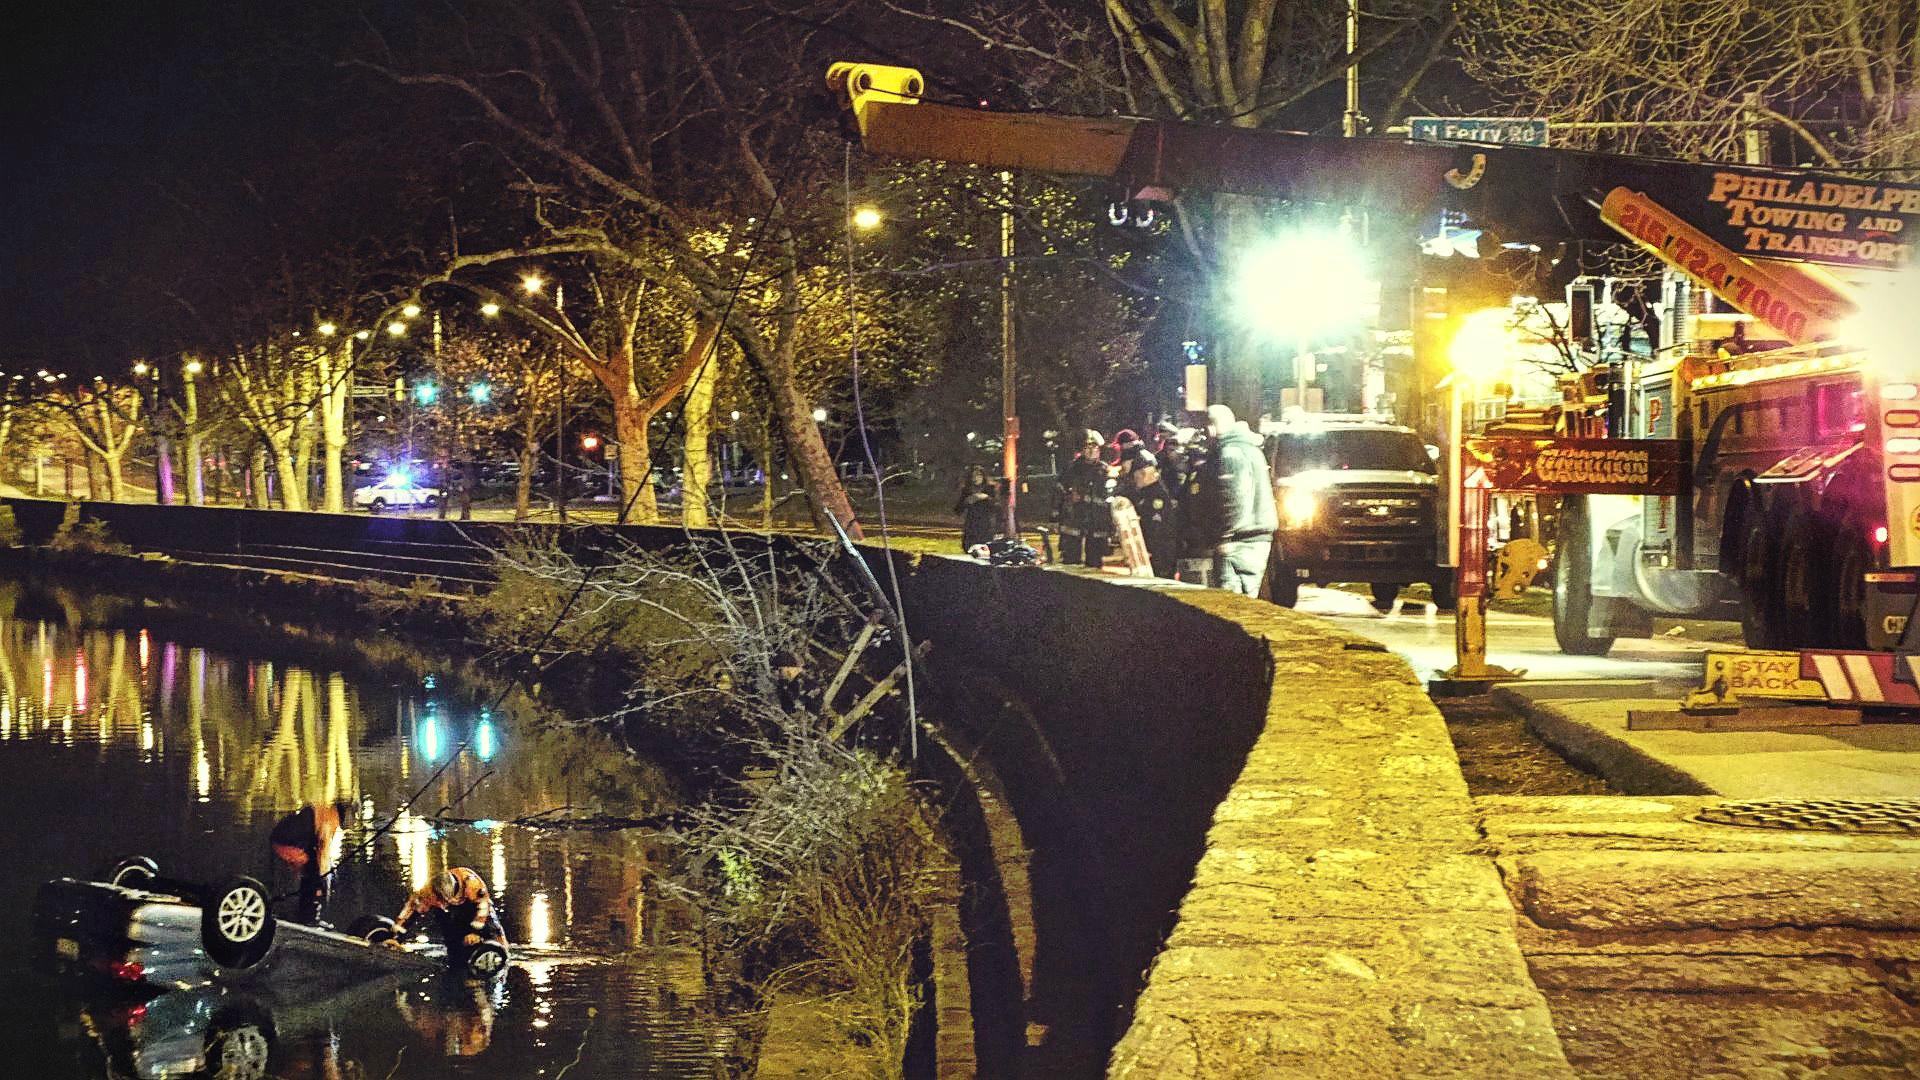 EastFallsLocal CAROLYN CARD SUTTON disaster on Kelly Drive divers haul